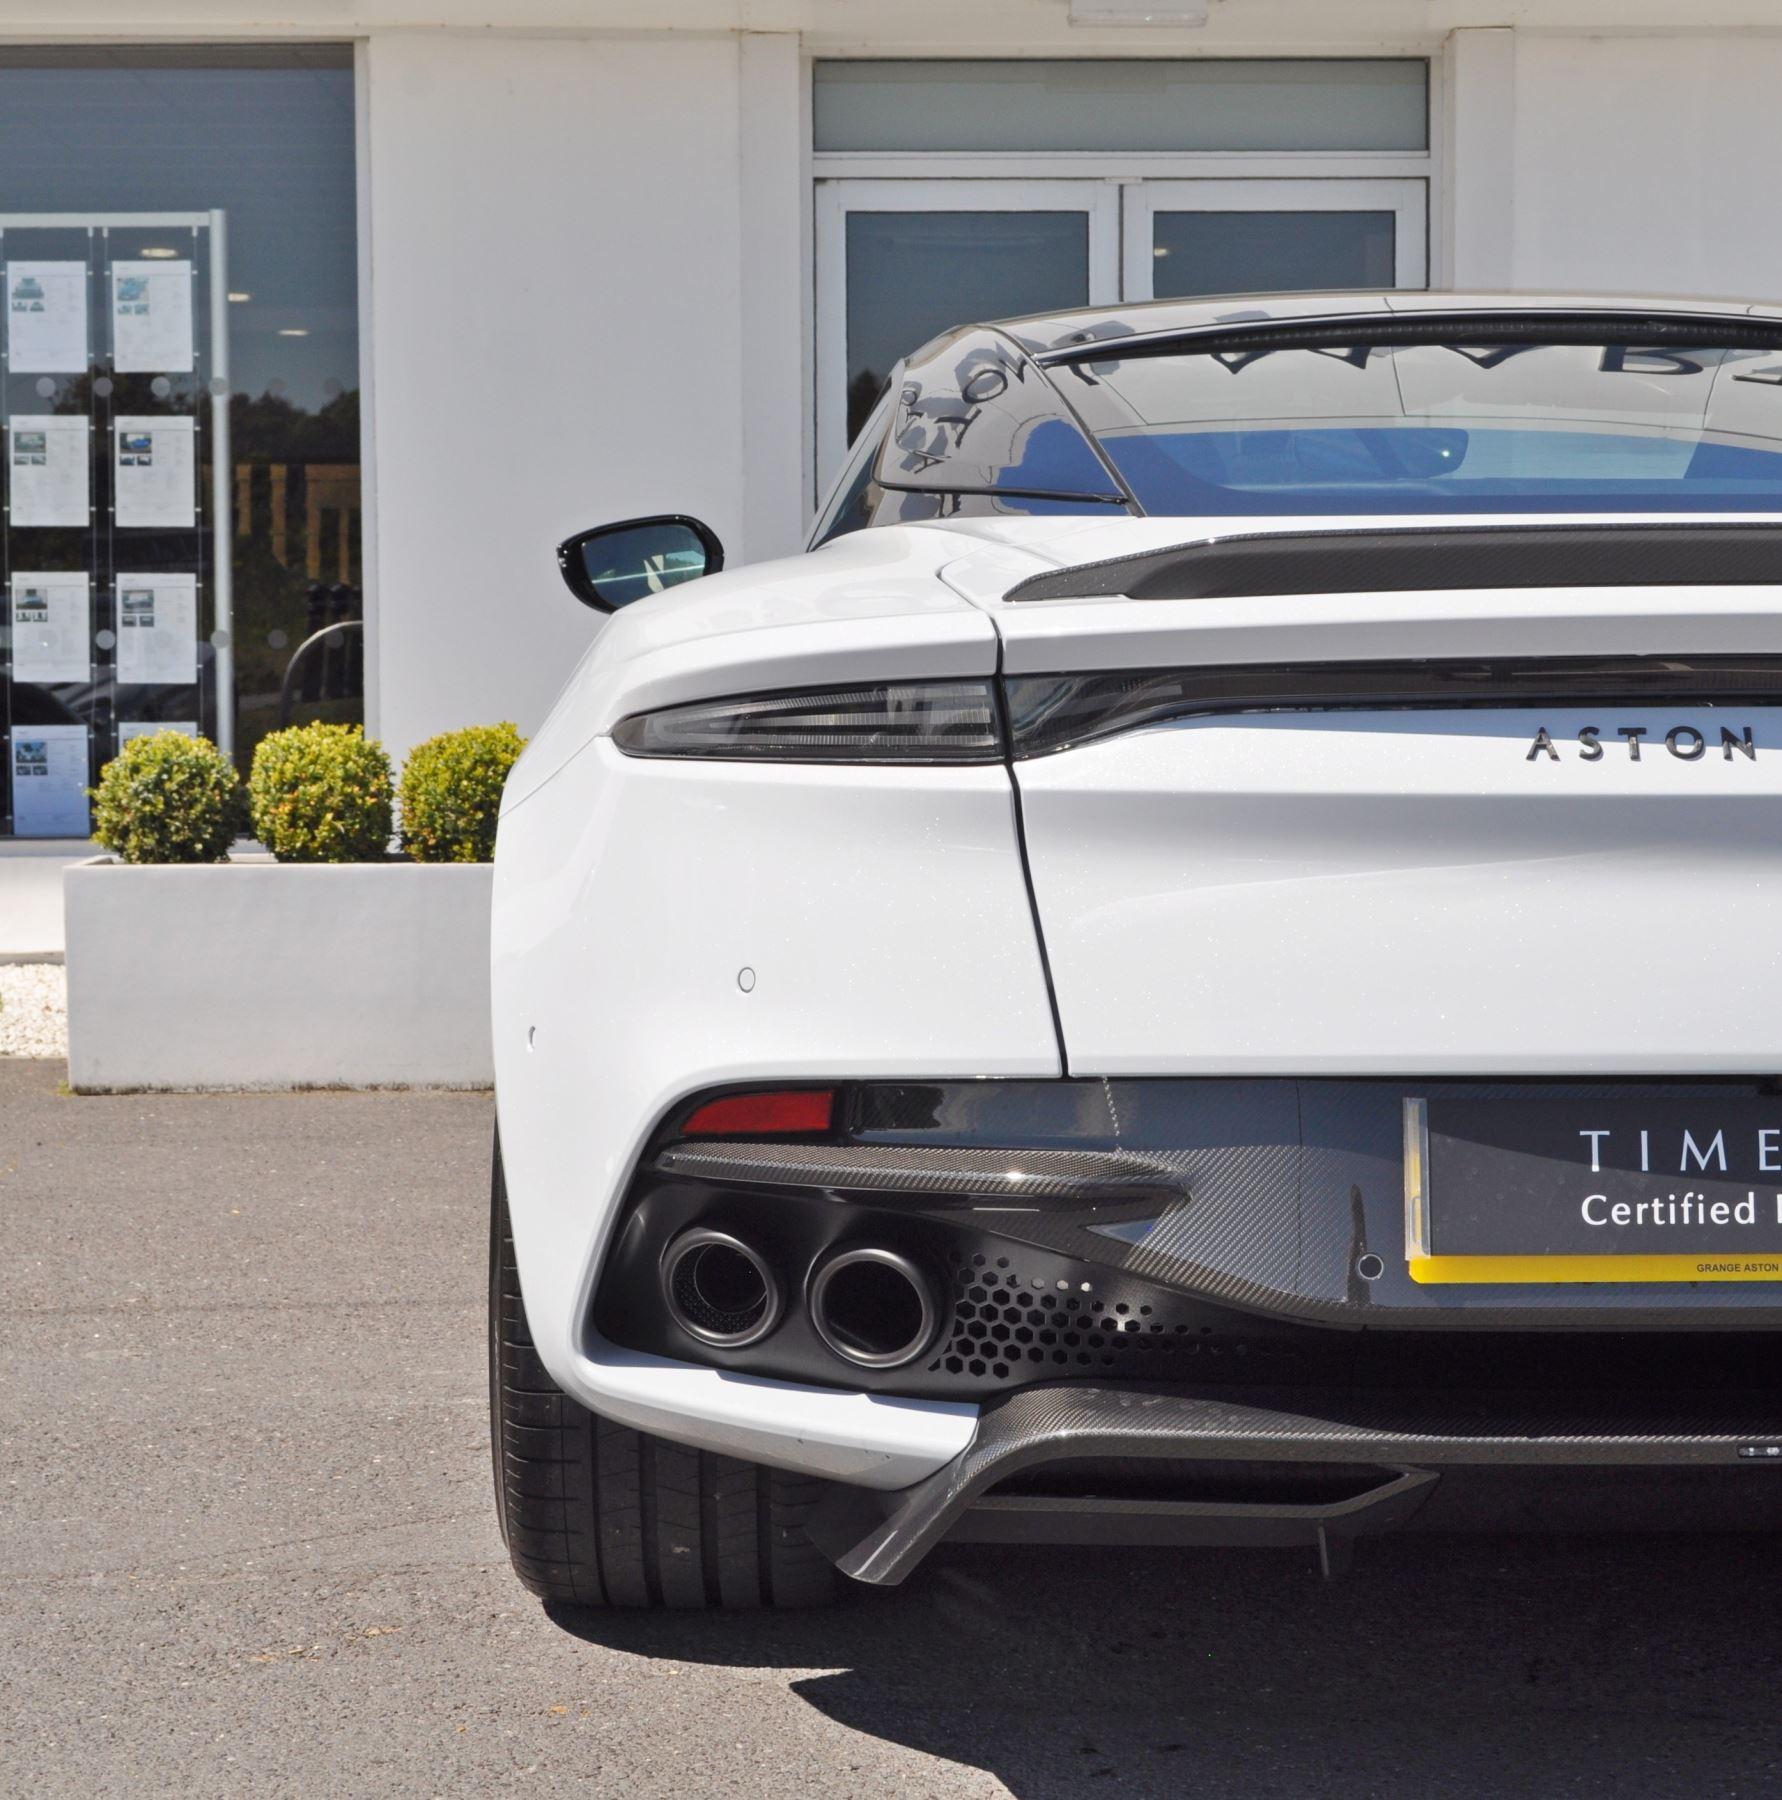 Aston Martin DBS V12 Superleggera 2dr Touchtronic image 51